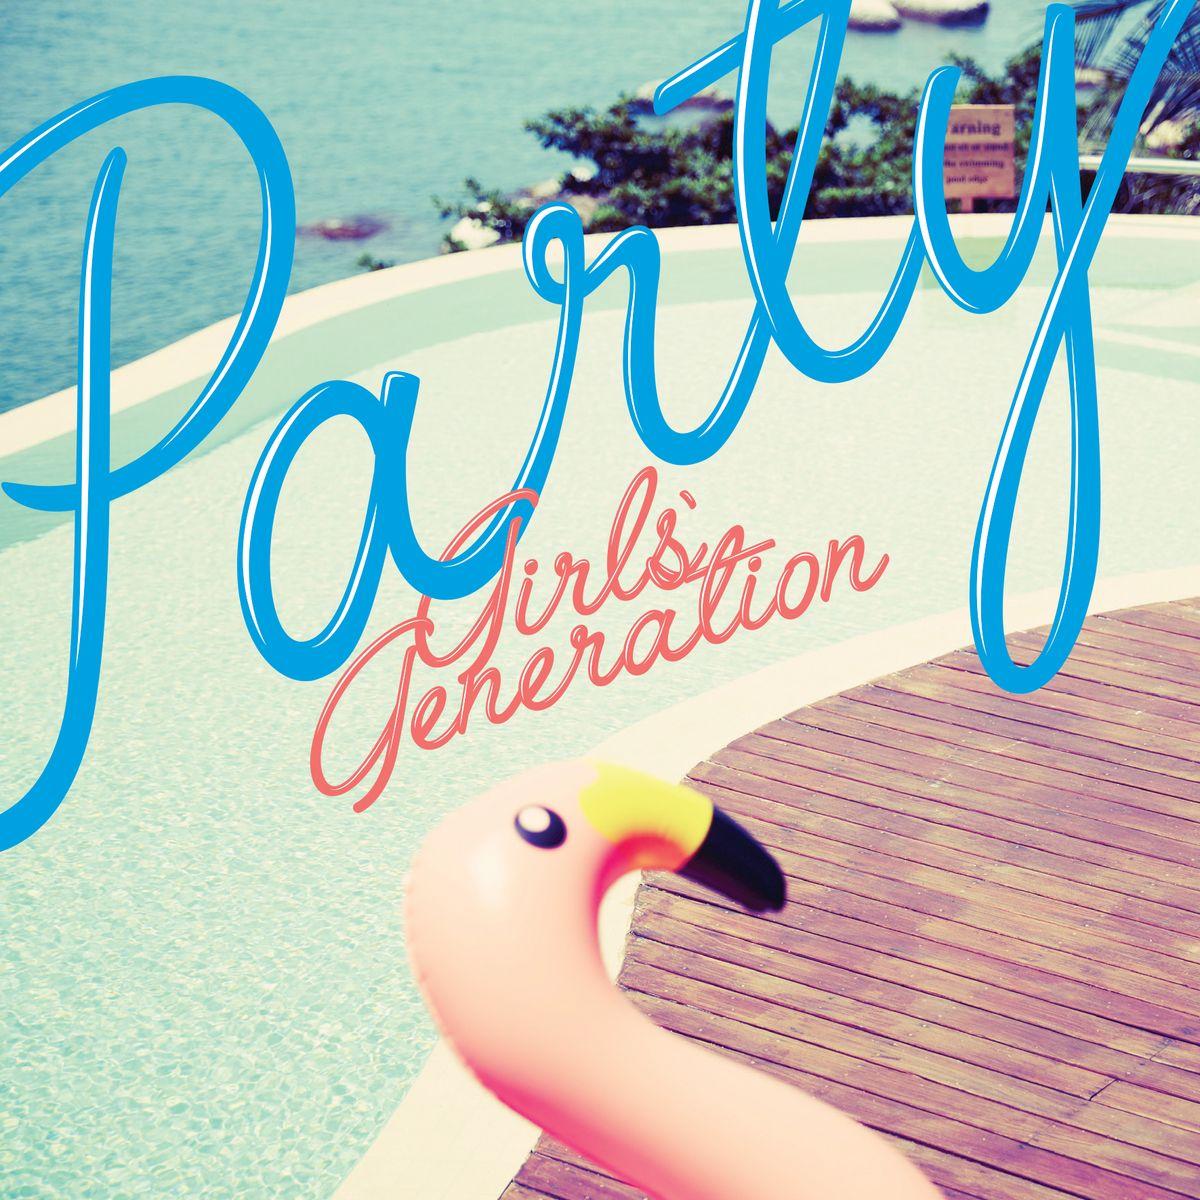 SNSD Party Picspam by NieInspirit on DeviantArt